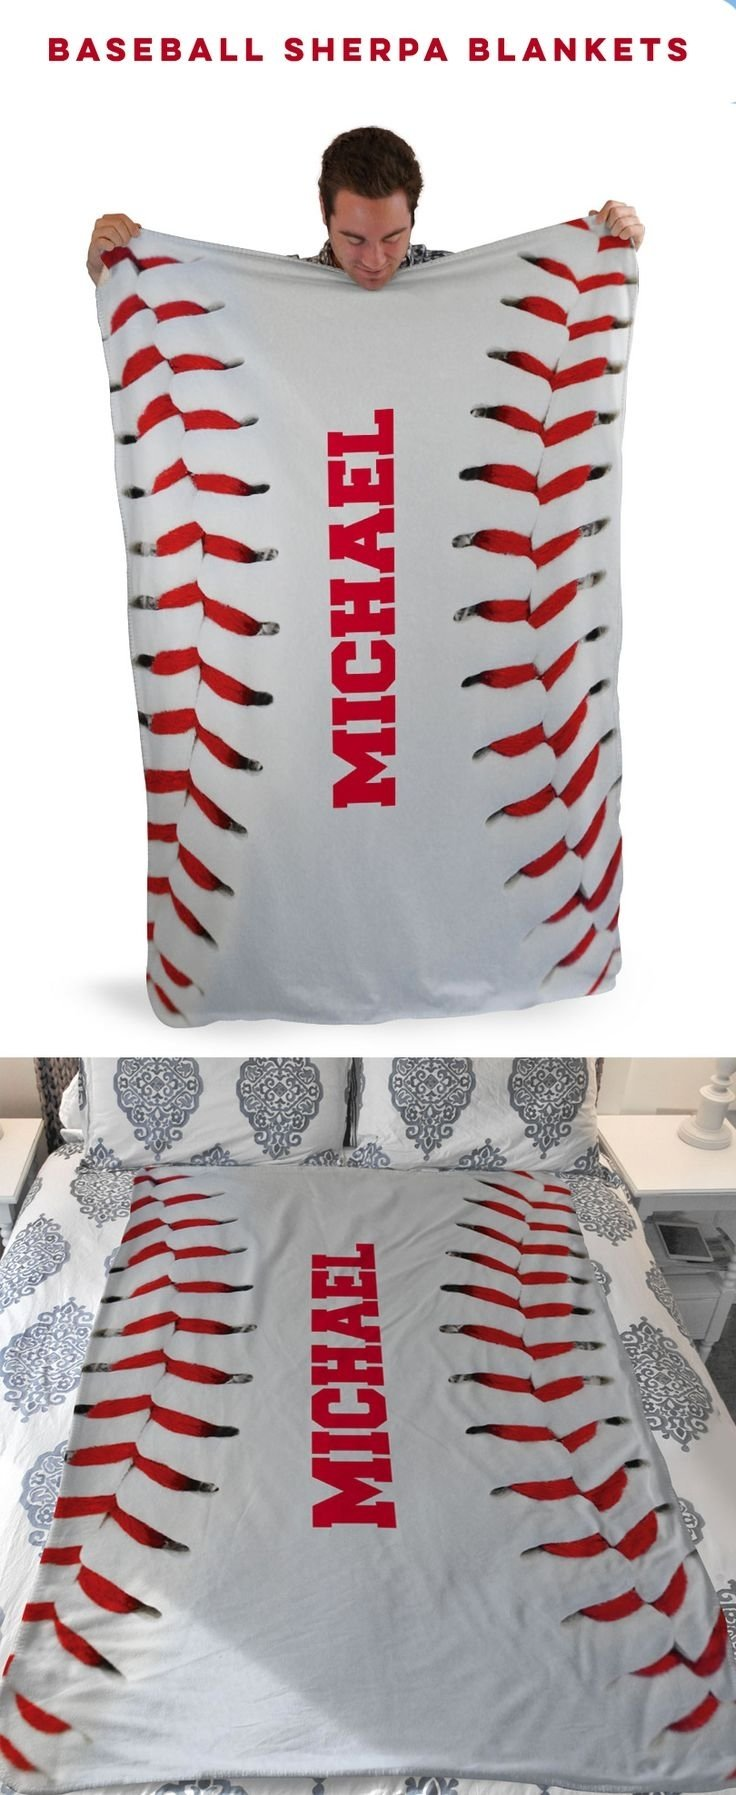 10 Stunning Gift Ideas For Baseball Players 400 best baseball gifts images on pinterest 2020